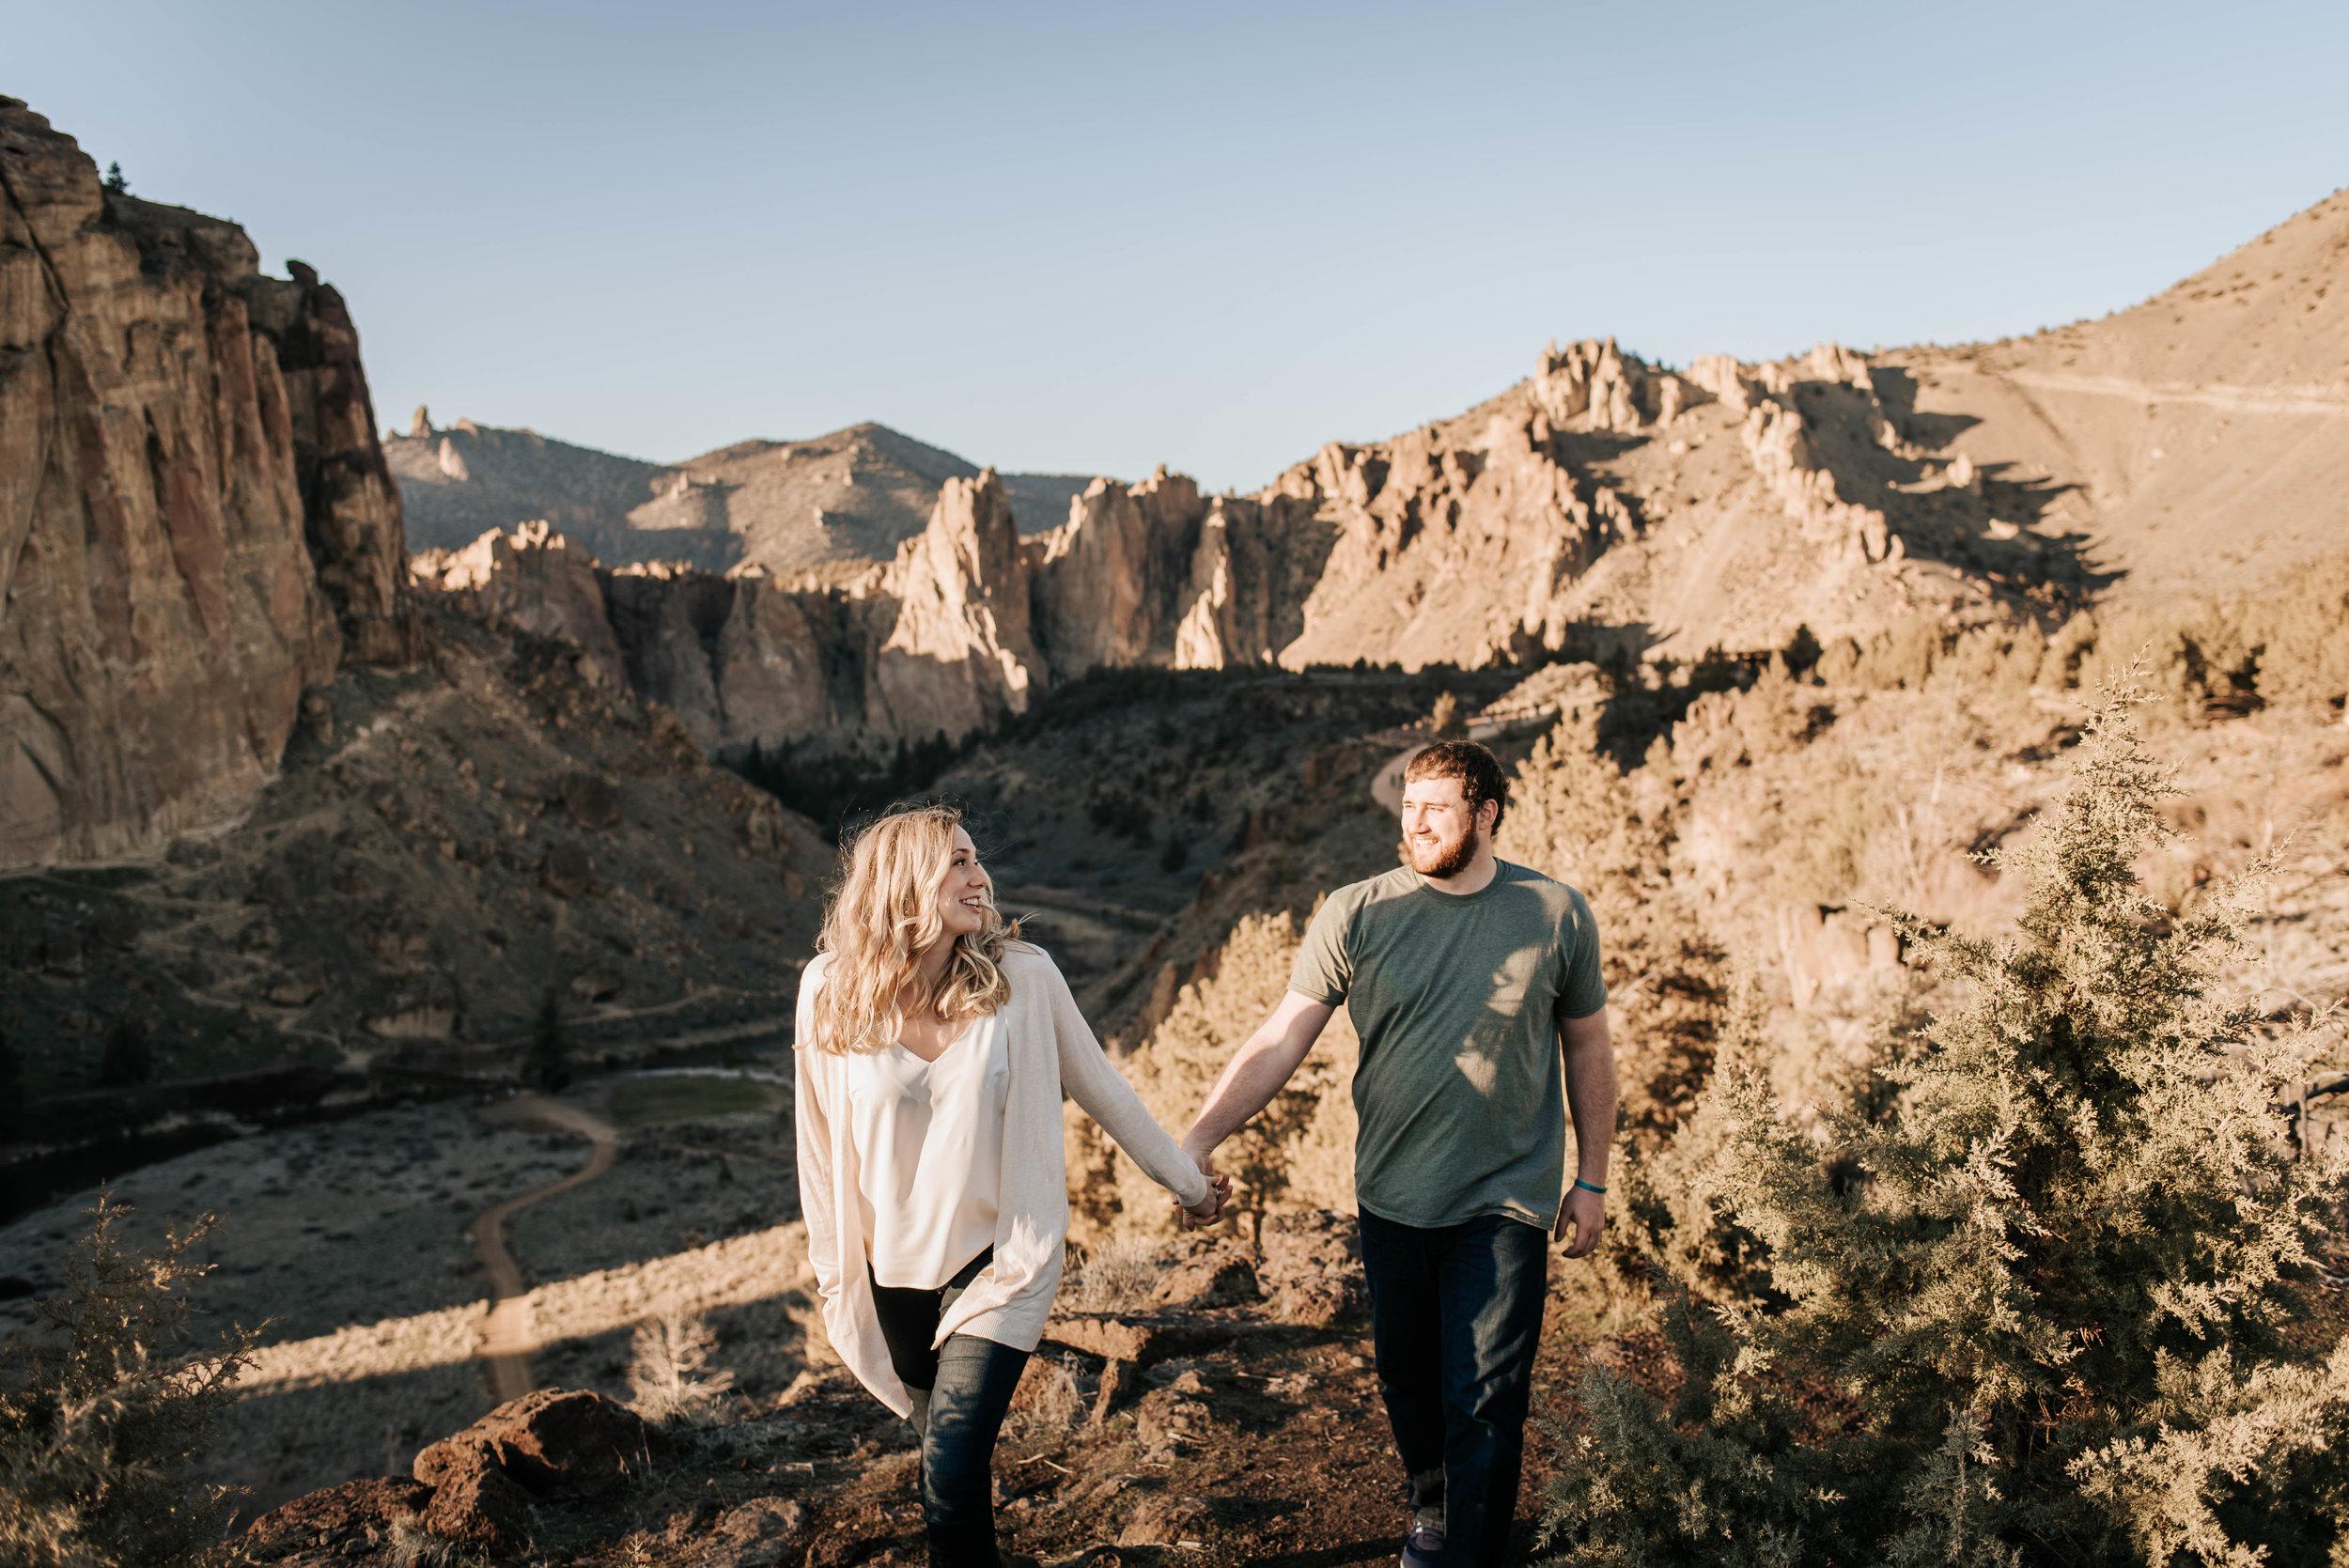 Brianna Bender Photography - Hannah & Jake (7 of 49).JPG